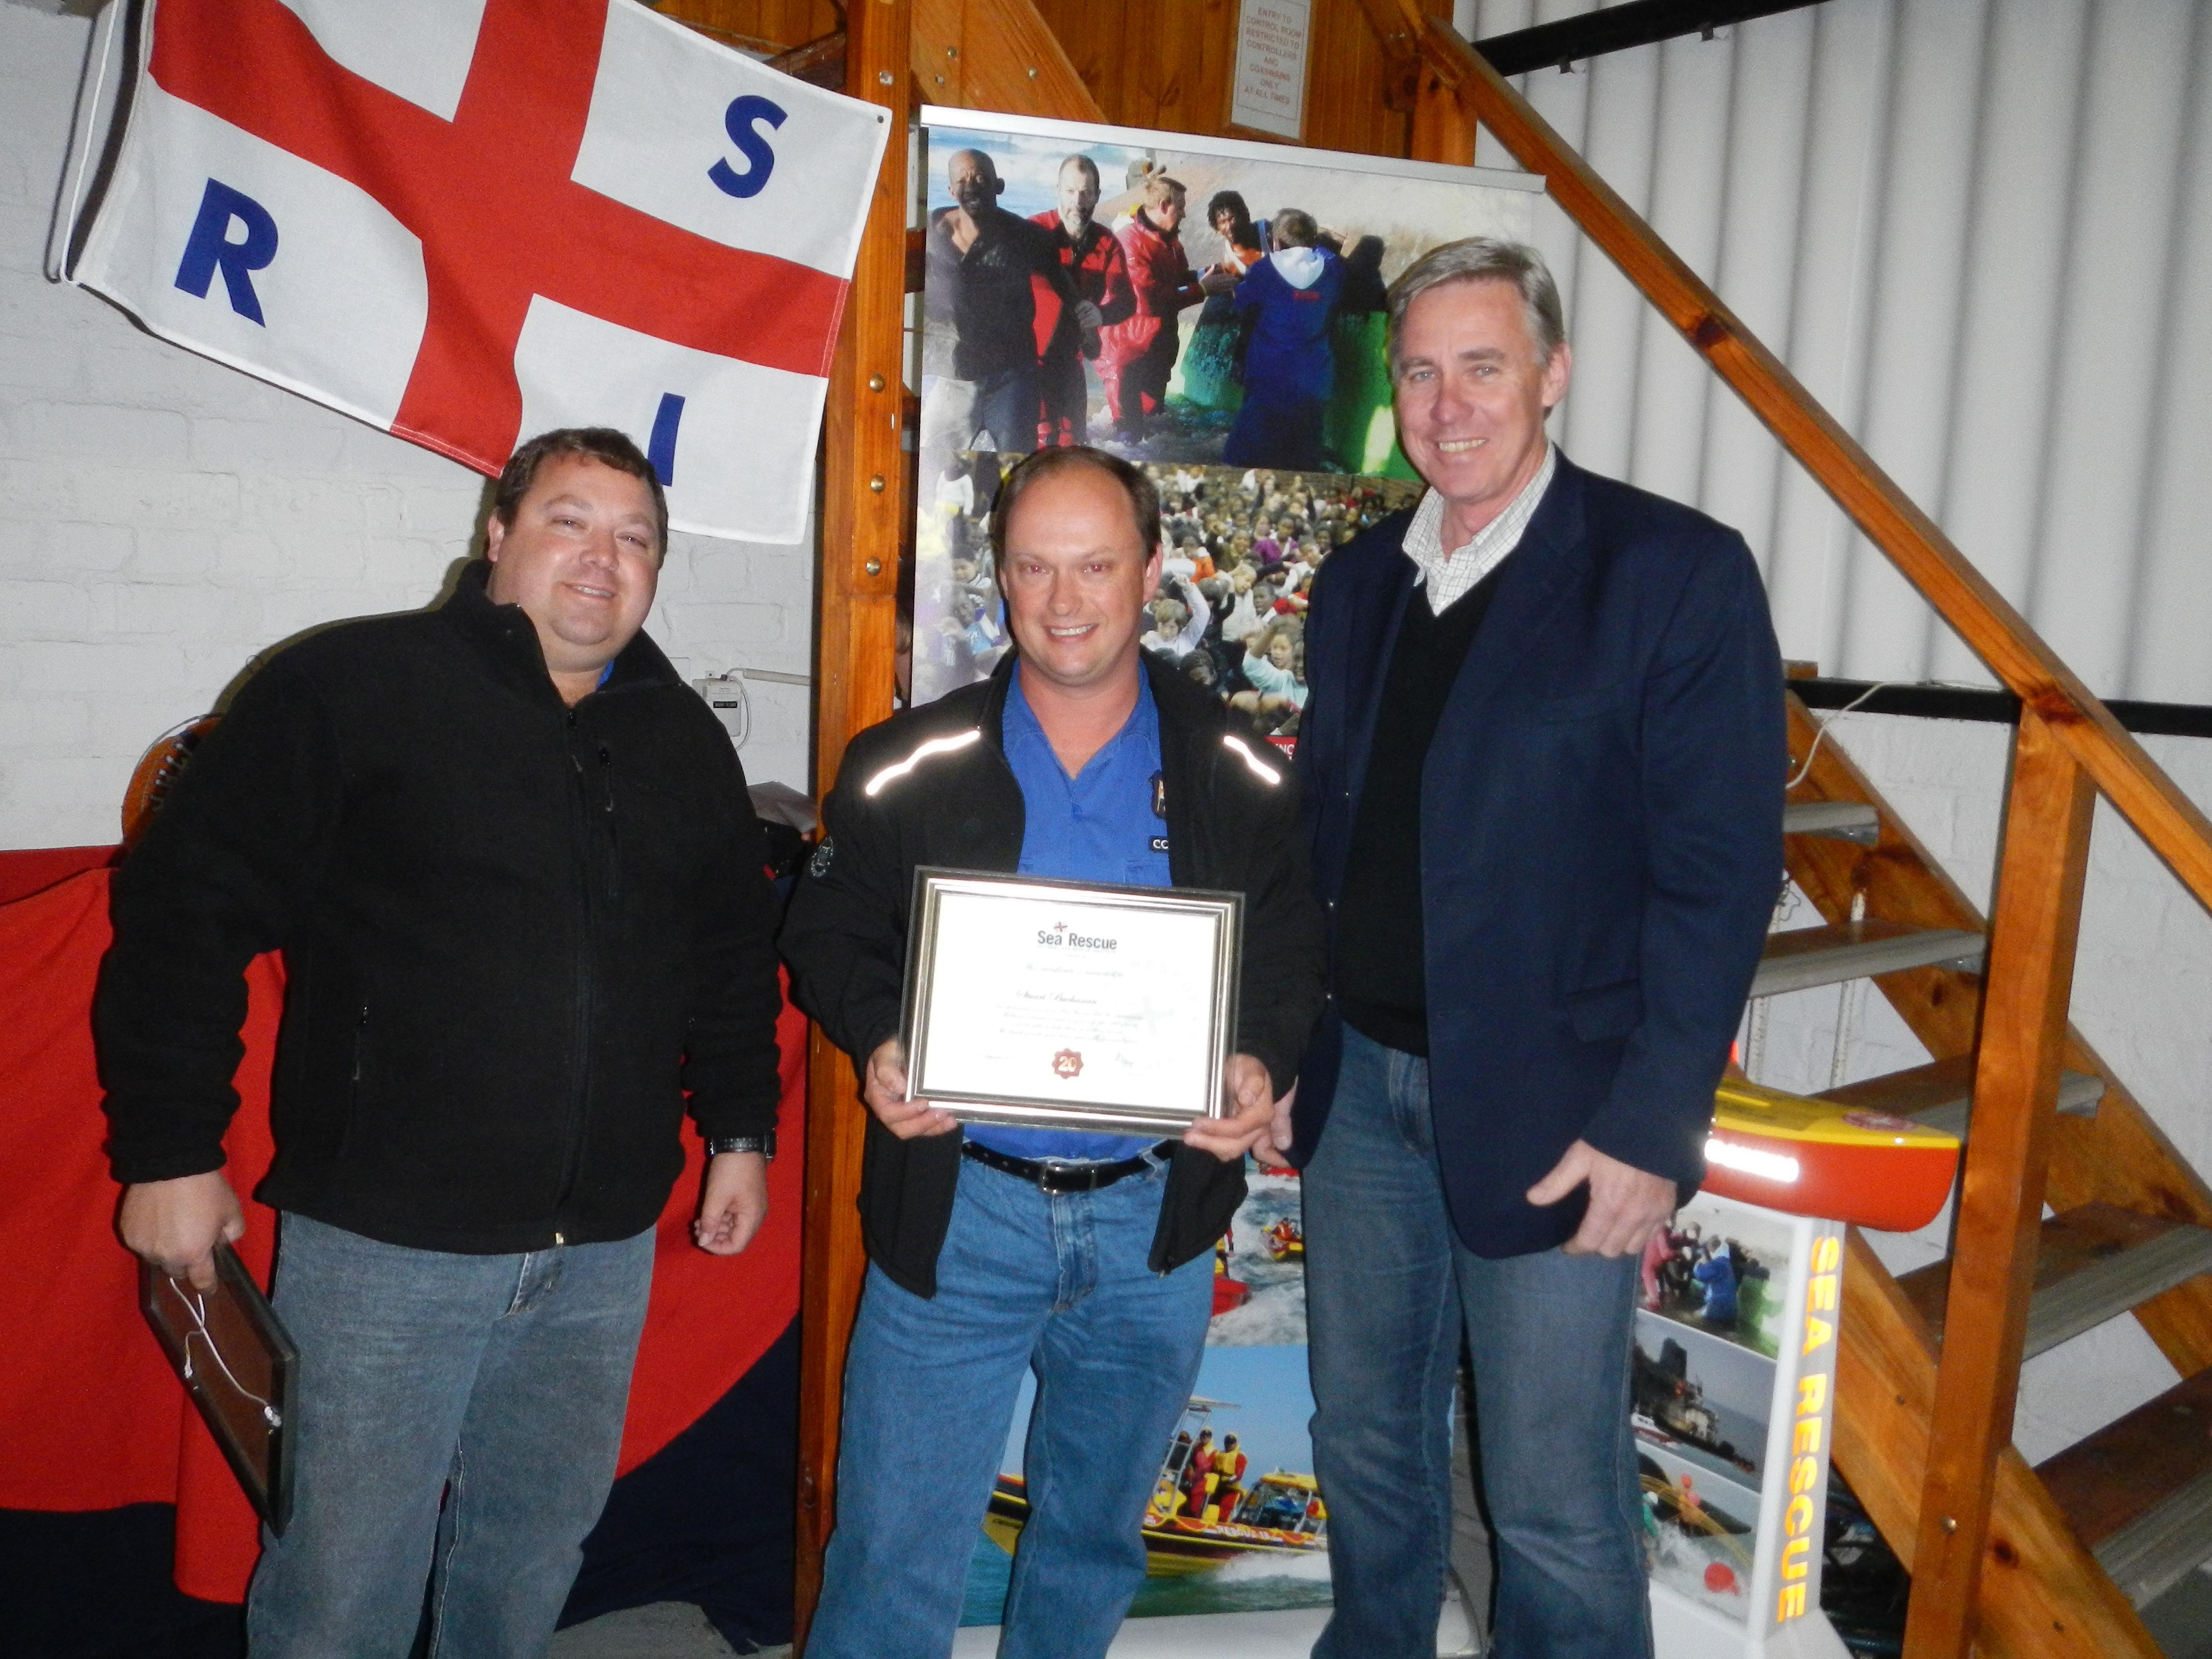 Stuart Buchanan receiving his 20 year service award